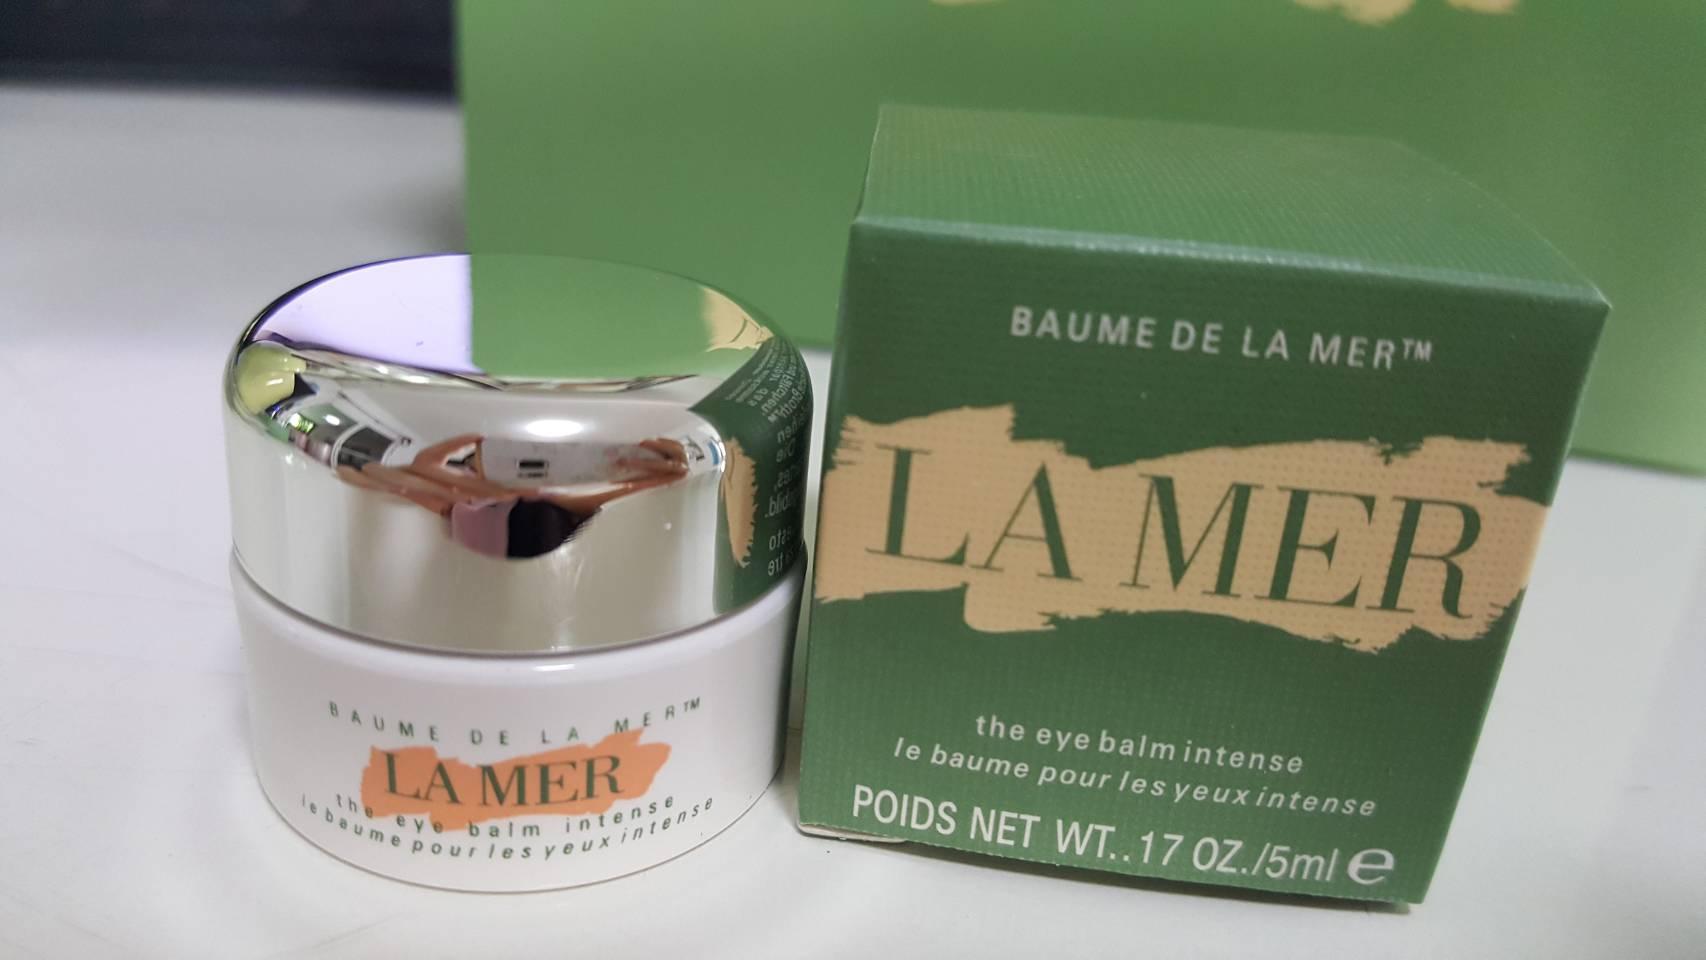 LA MER The Eye Balm Intense 5ml.อายบาล์ม ขนาดทดลอง ถ่ายจากสินค้าจริงที่จำหน่ายค่ะ